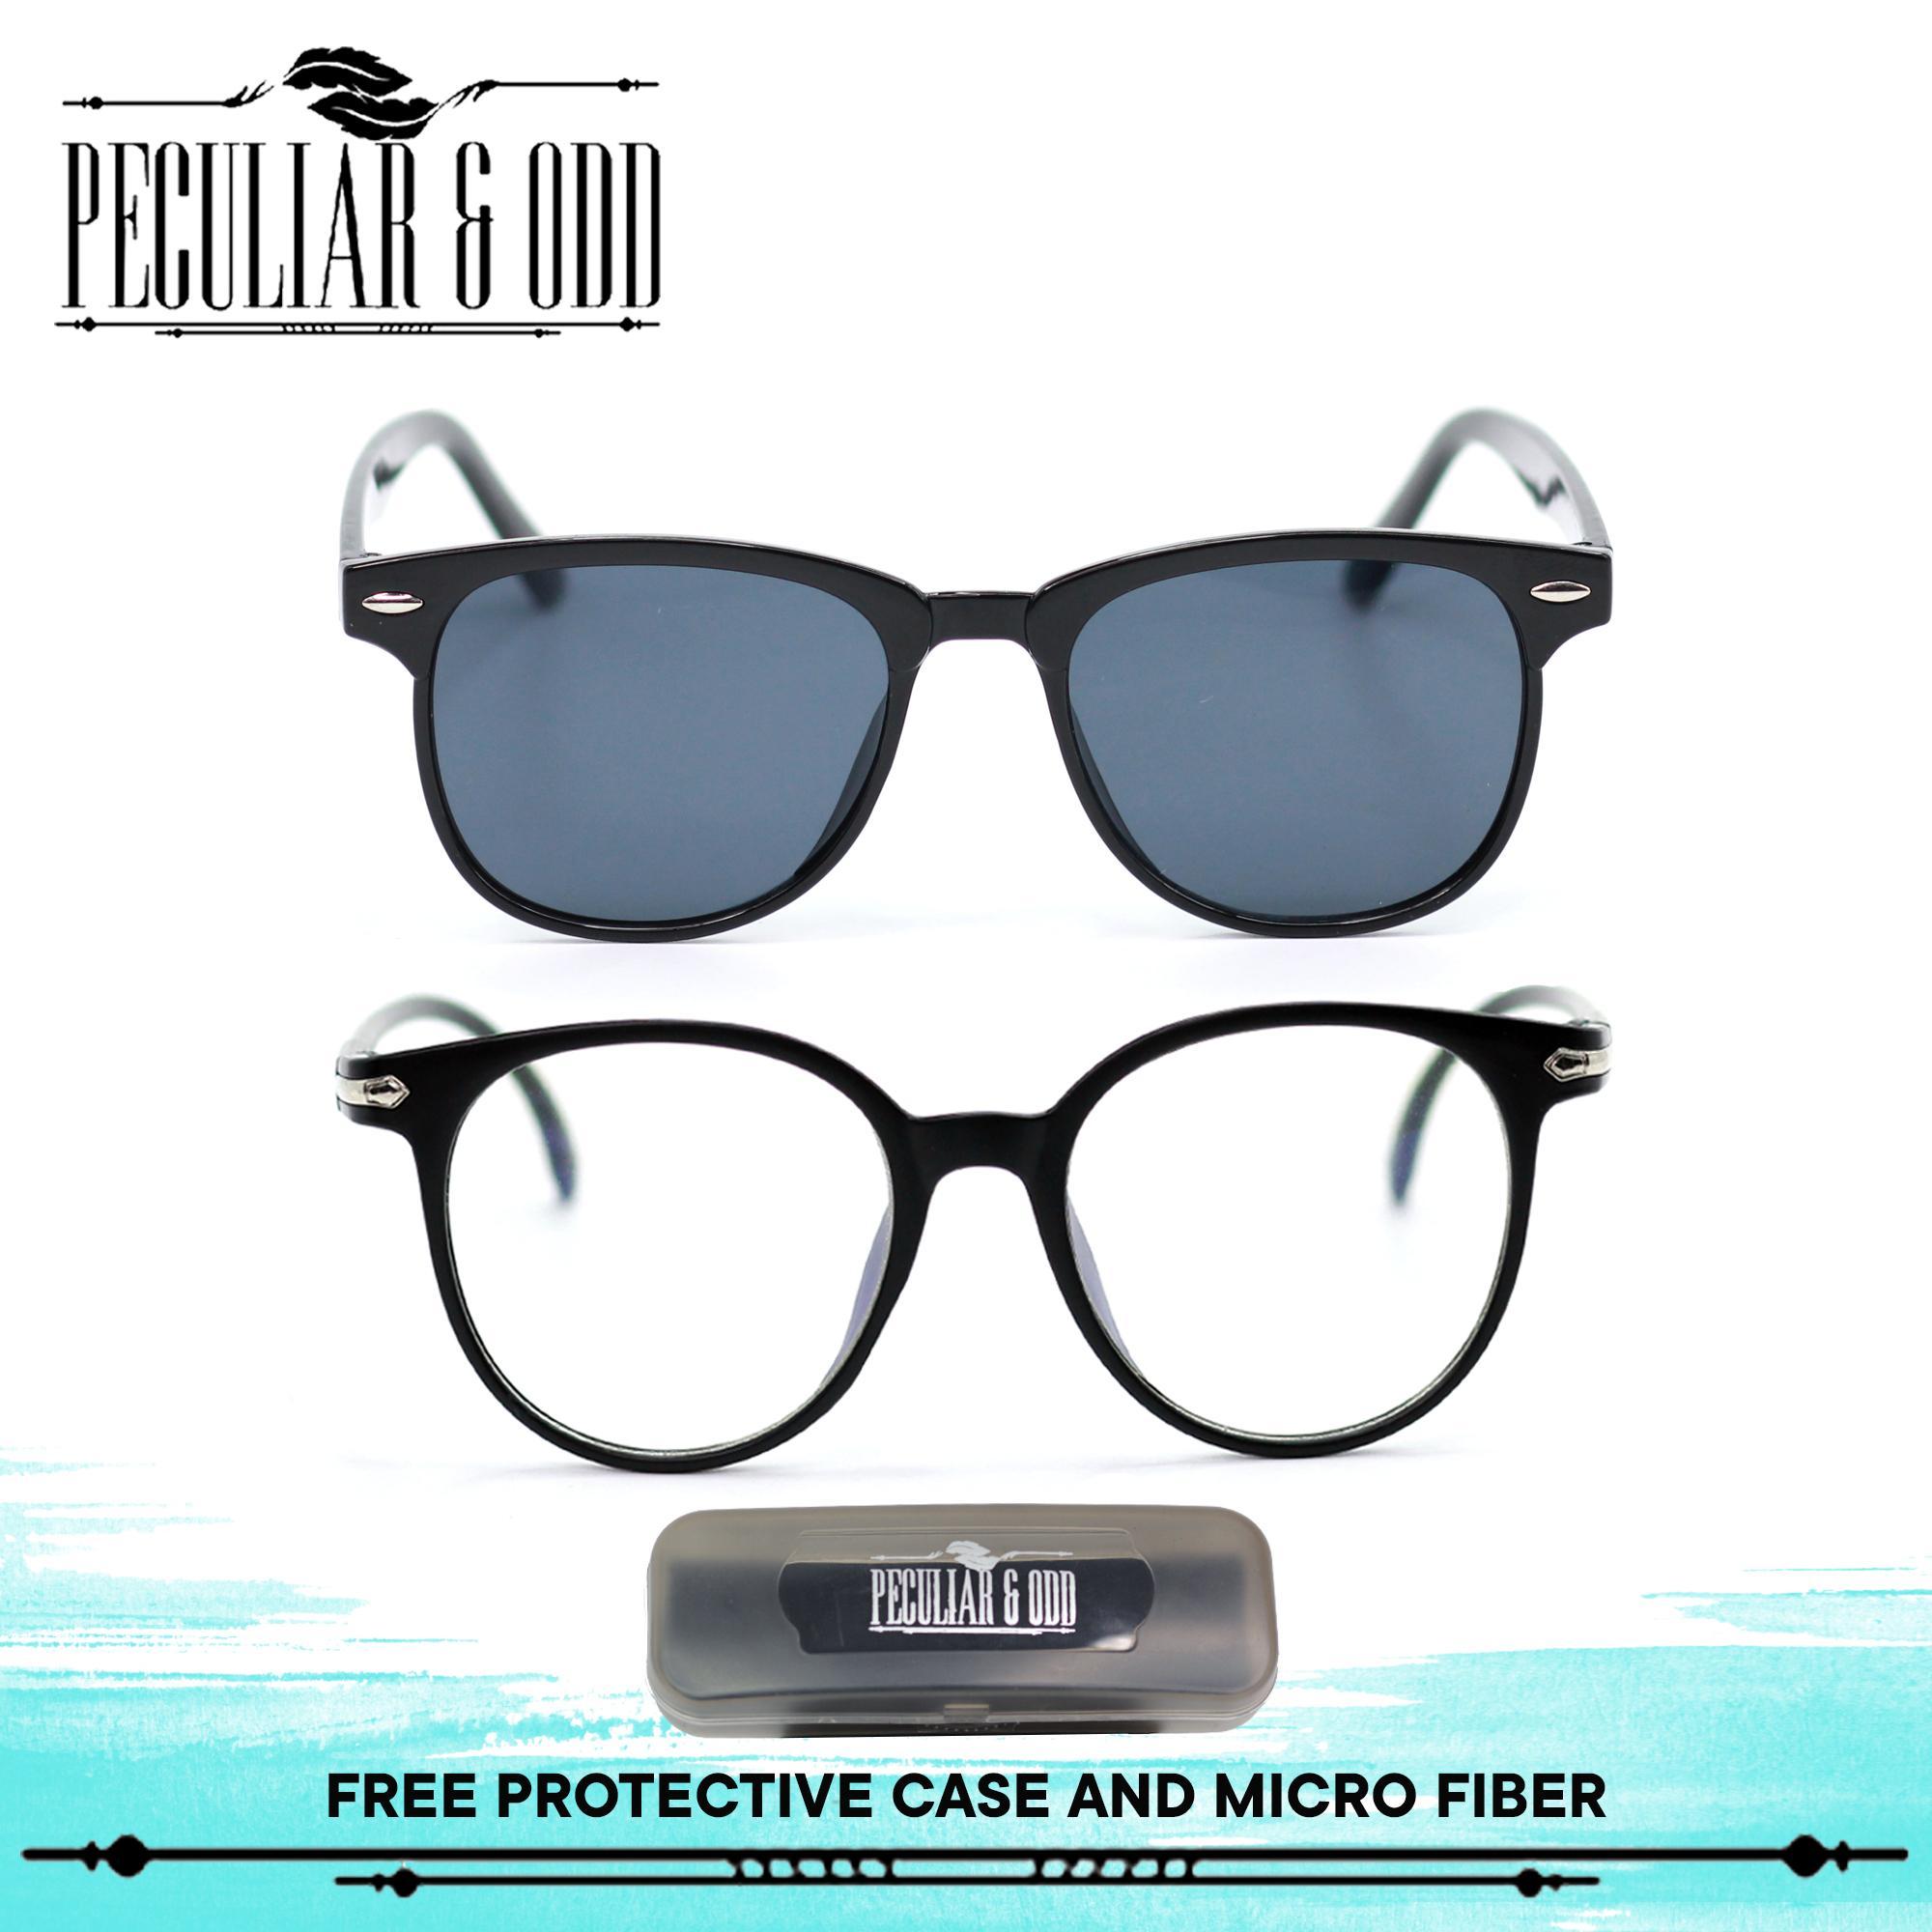 Peculiar Set of 2 721 Black Sunglass and 15959 Black Unisex Computer  Eyeglasses Anti Radiation   f49692022f00c